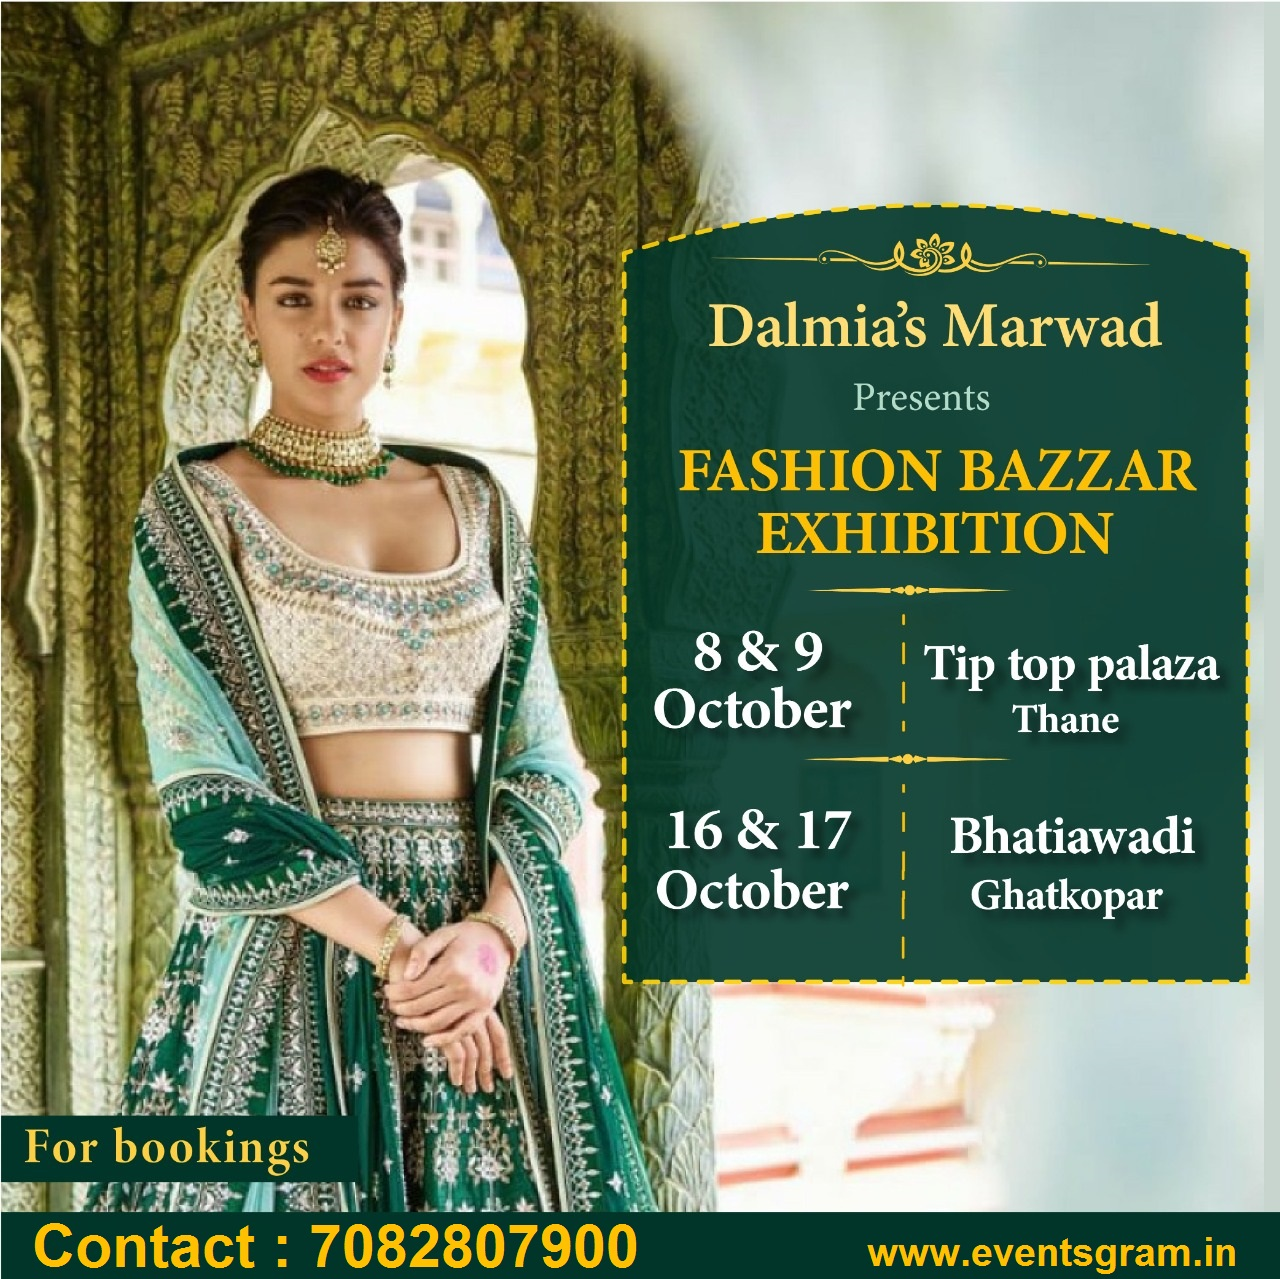 Fashion Bazzar Exhibition